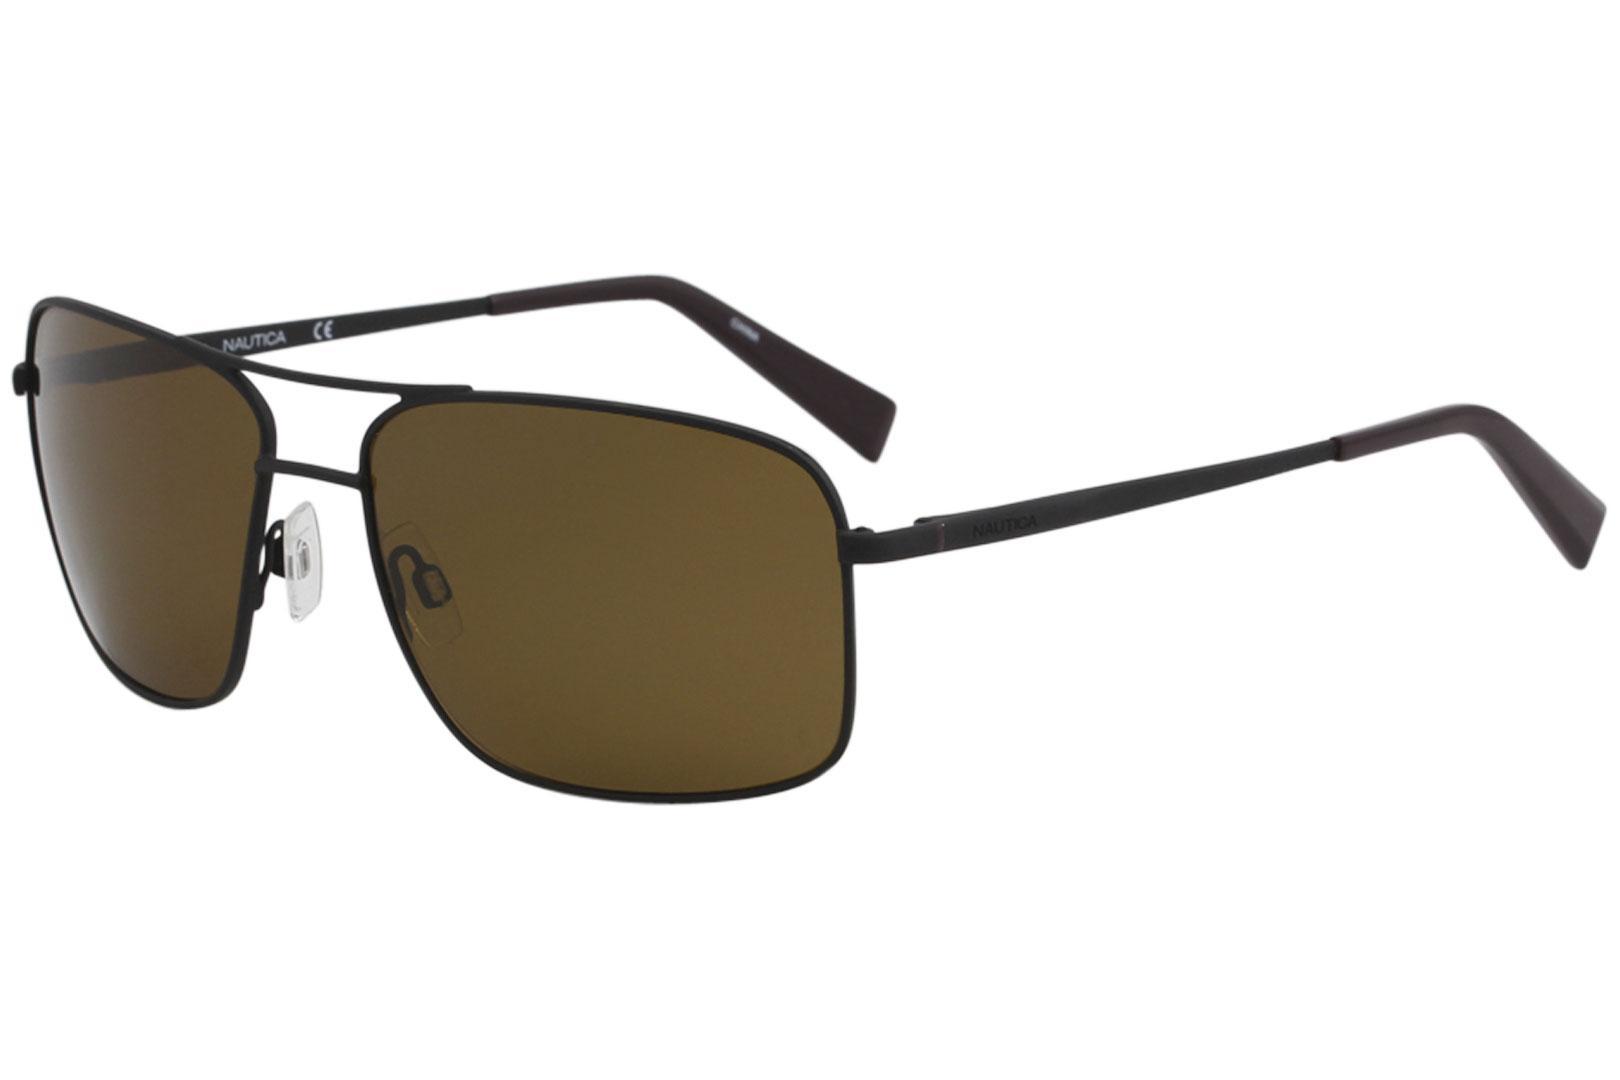 174588f7e3566 Nautica Men s N5115S N 5115 S Fashion Pilot Polarized Sunglasses by Nautica